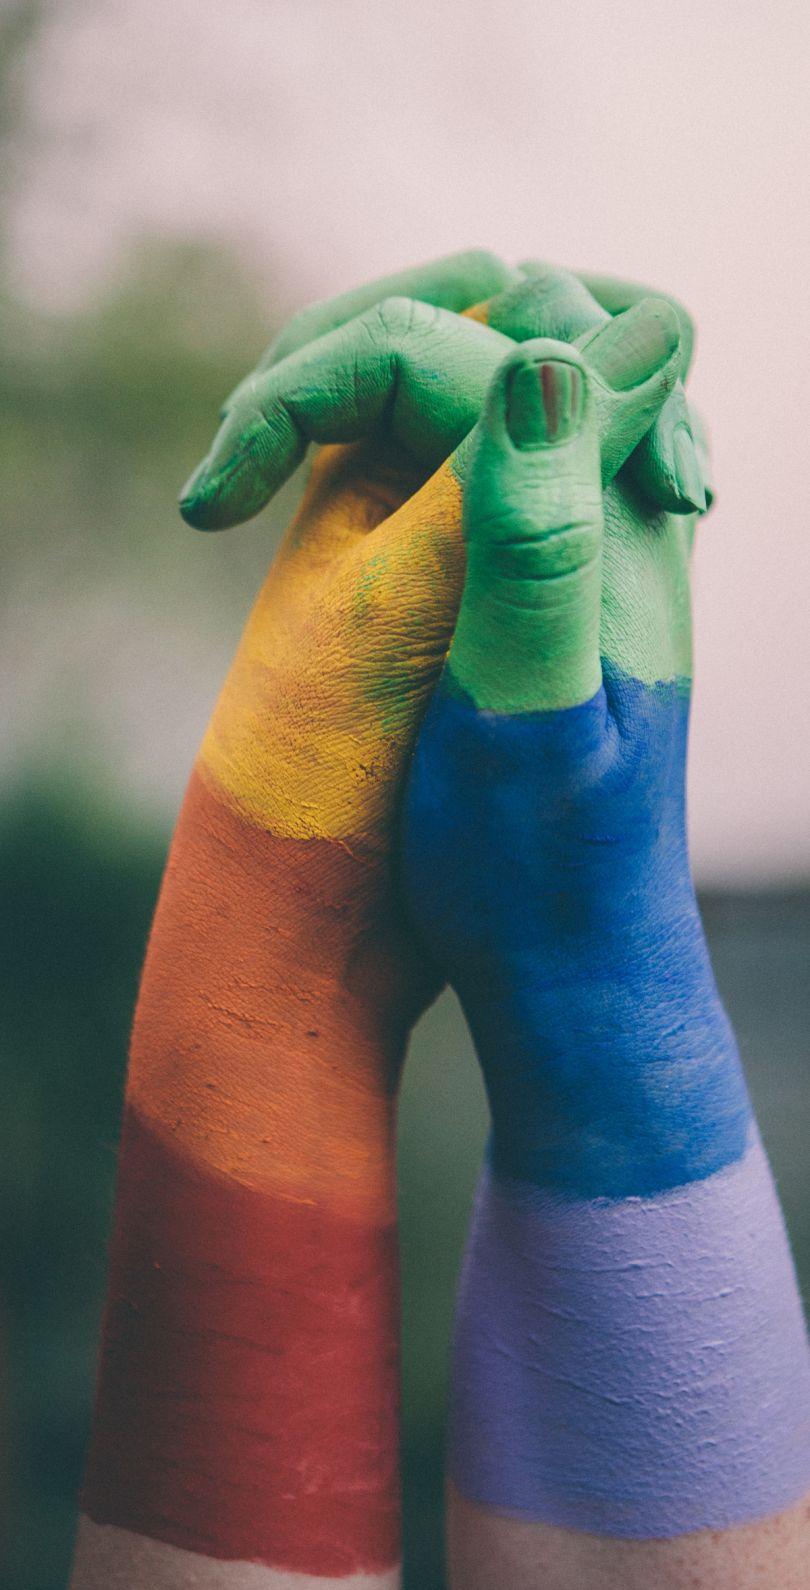 ID: [179179711](https://stock.adobe.com/images/hands-painted-in-gay-pride-rainbow/179179711?prev_url=detail)